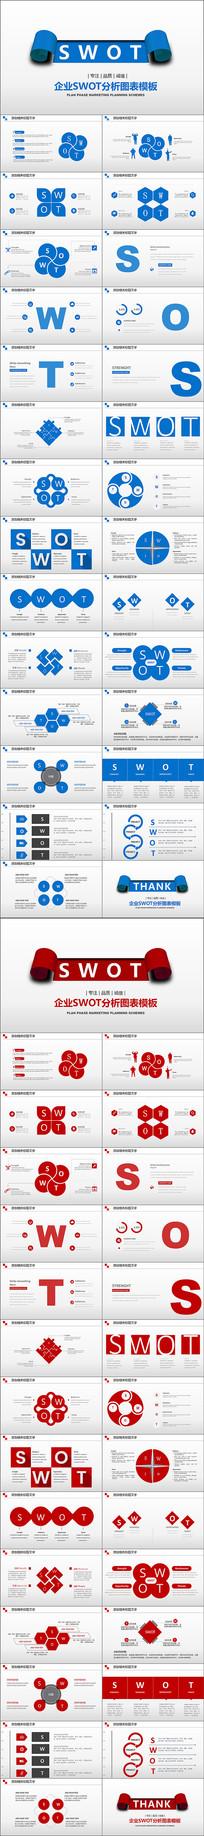 蓝红SWOT分析PPT模板